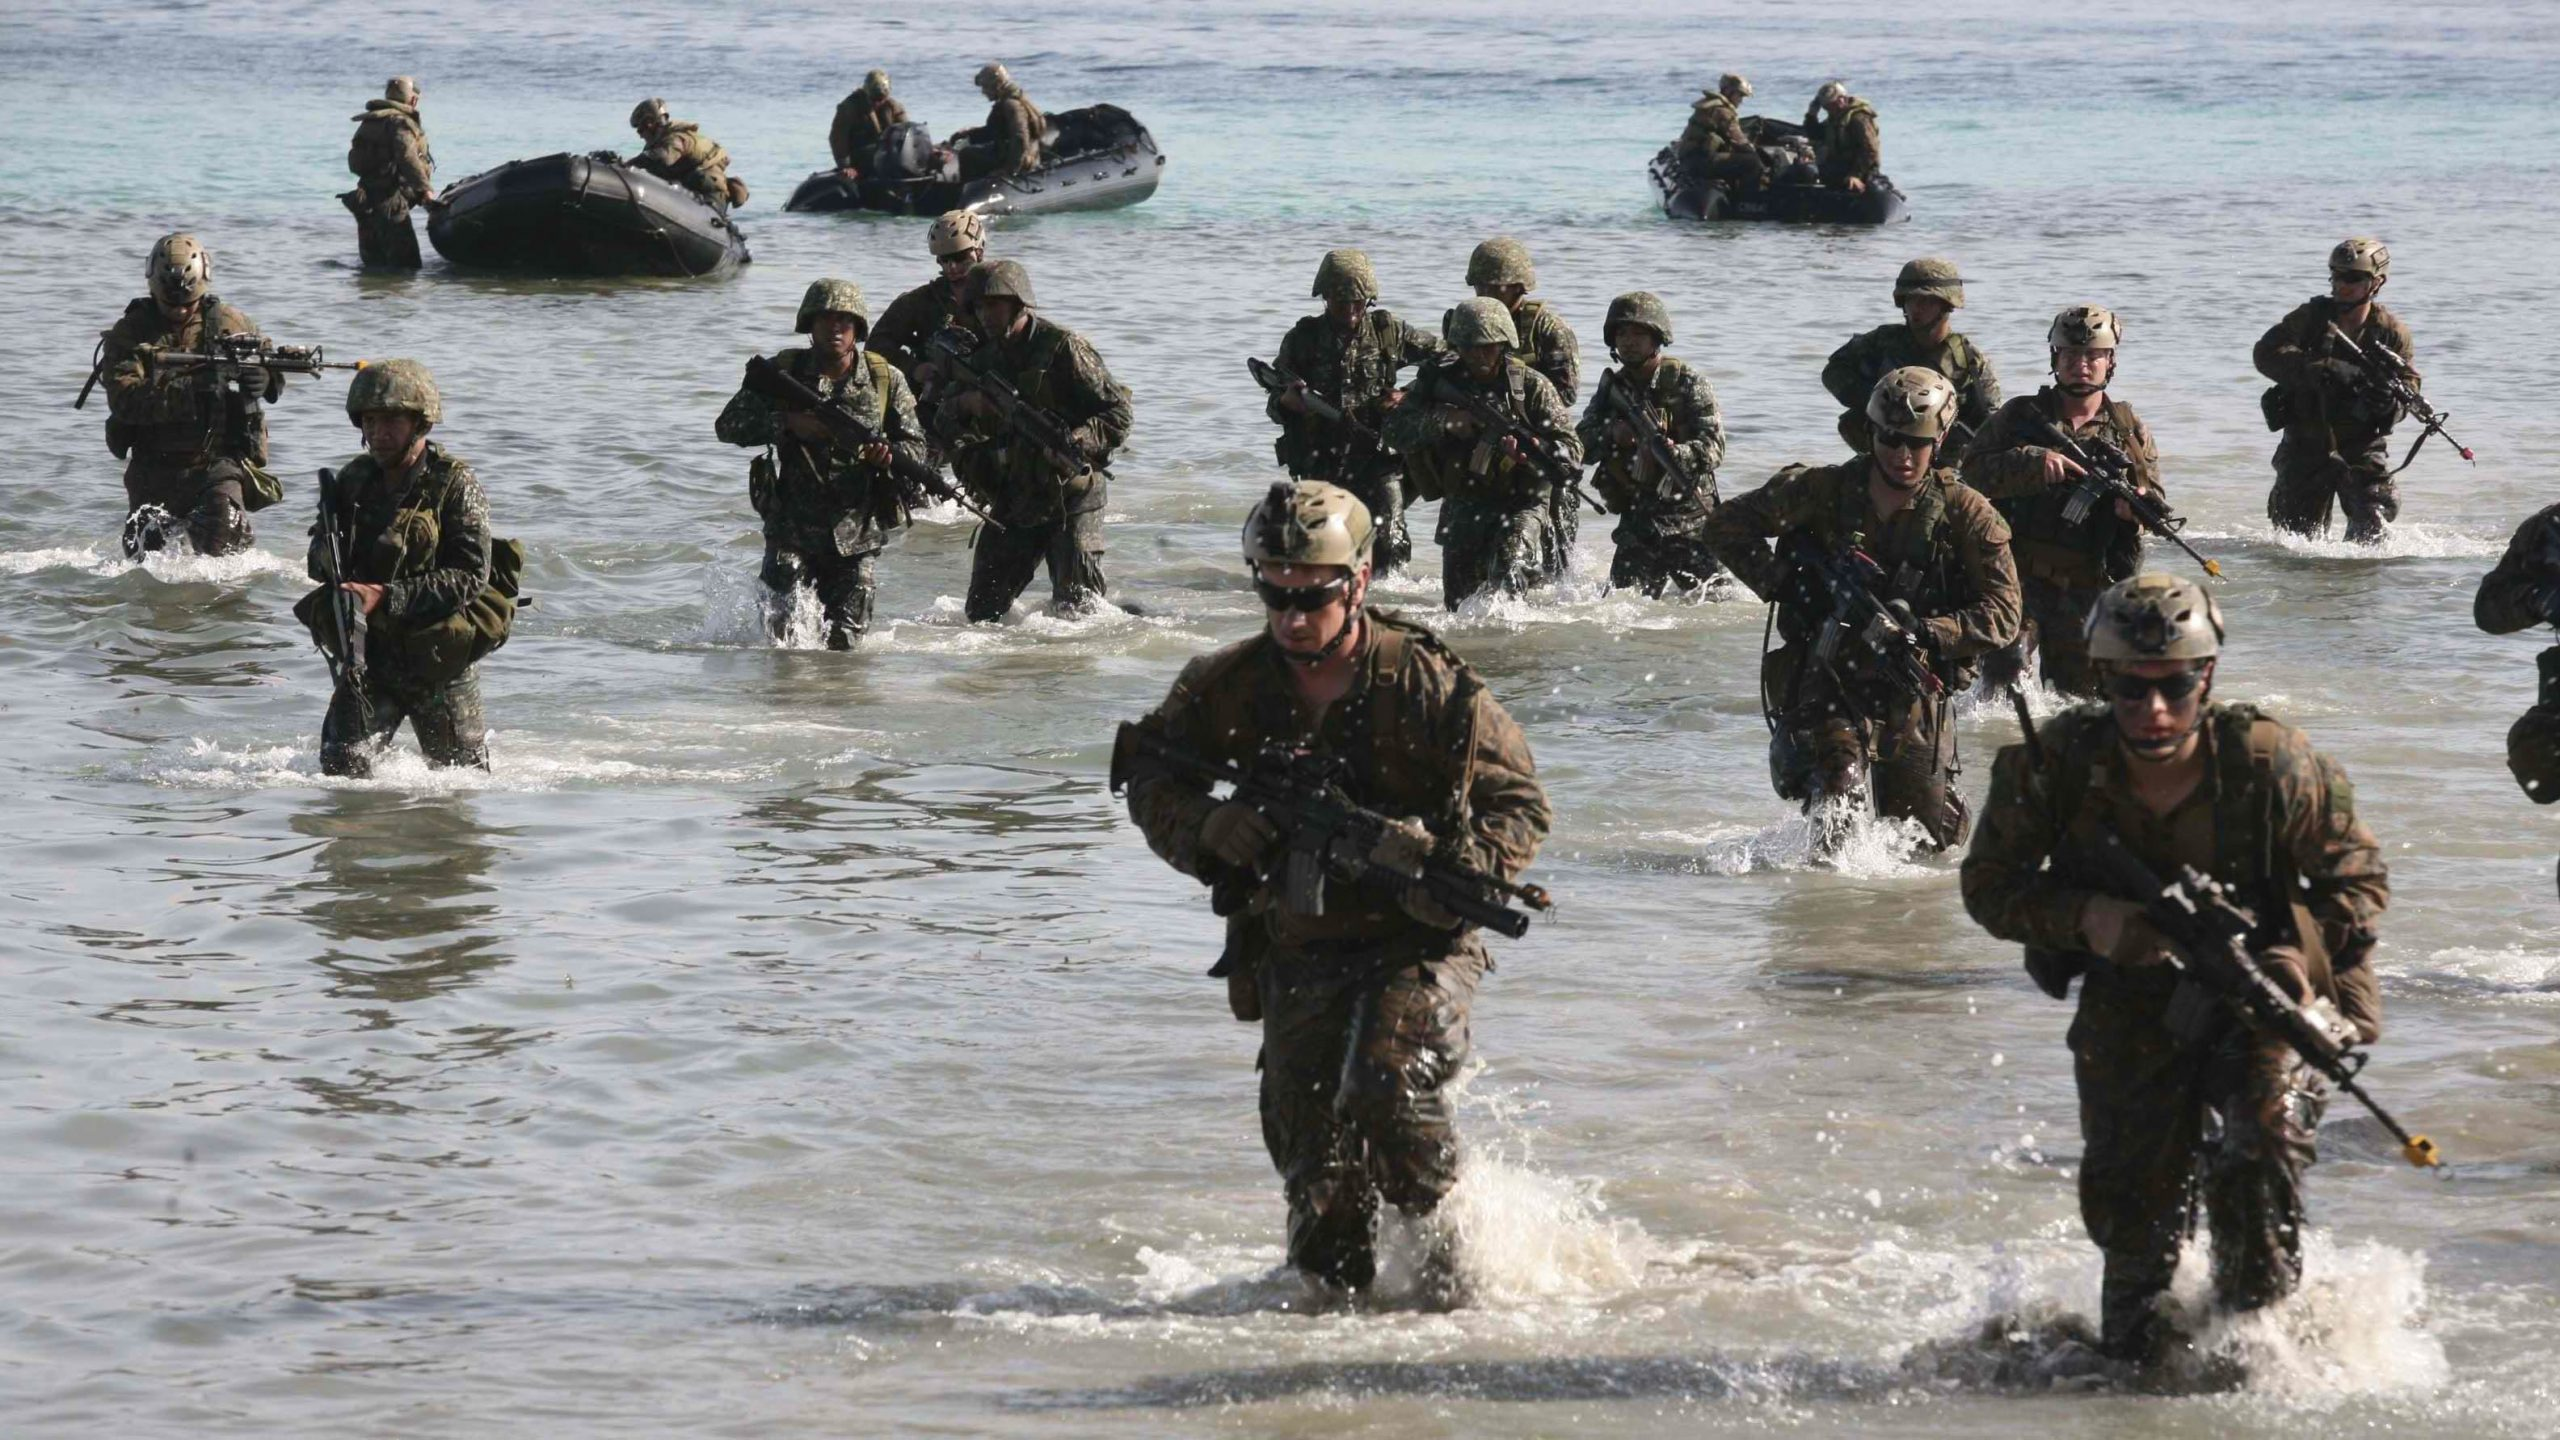 Archipelagic Coastal Defense – The New Operational Doctrine of the Philippine Marine Corps